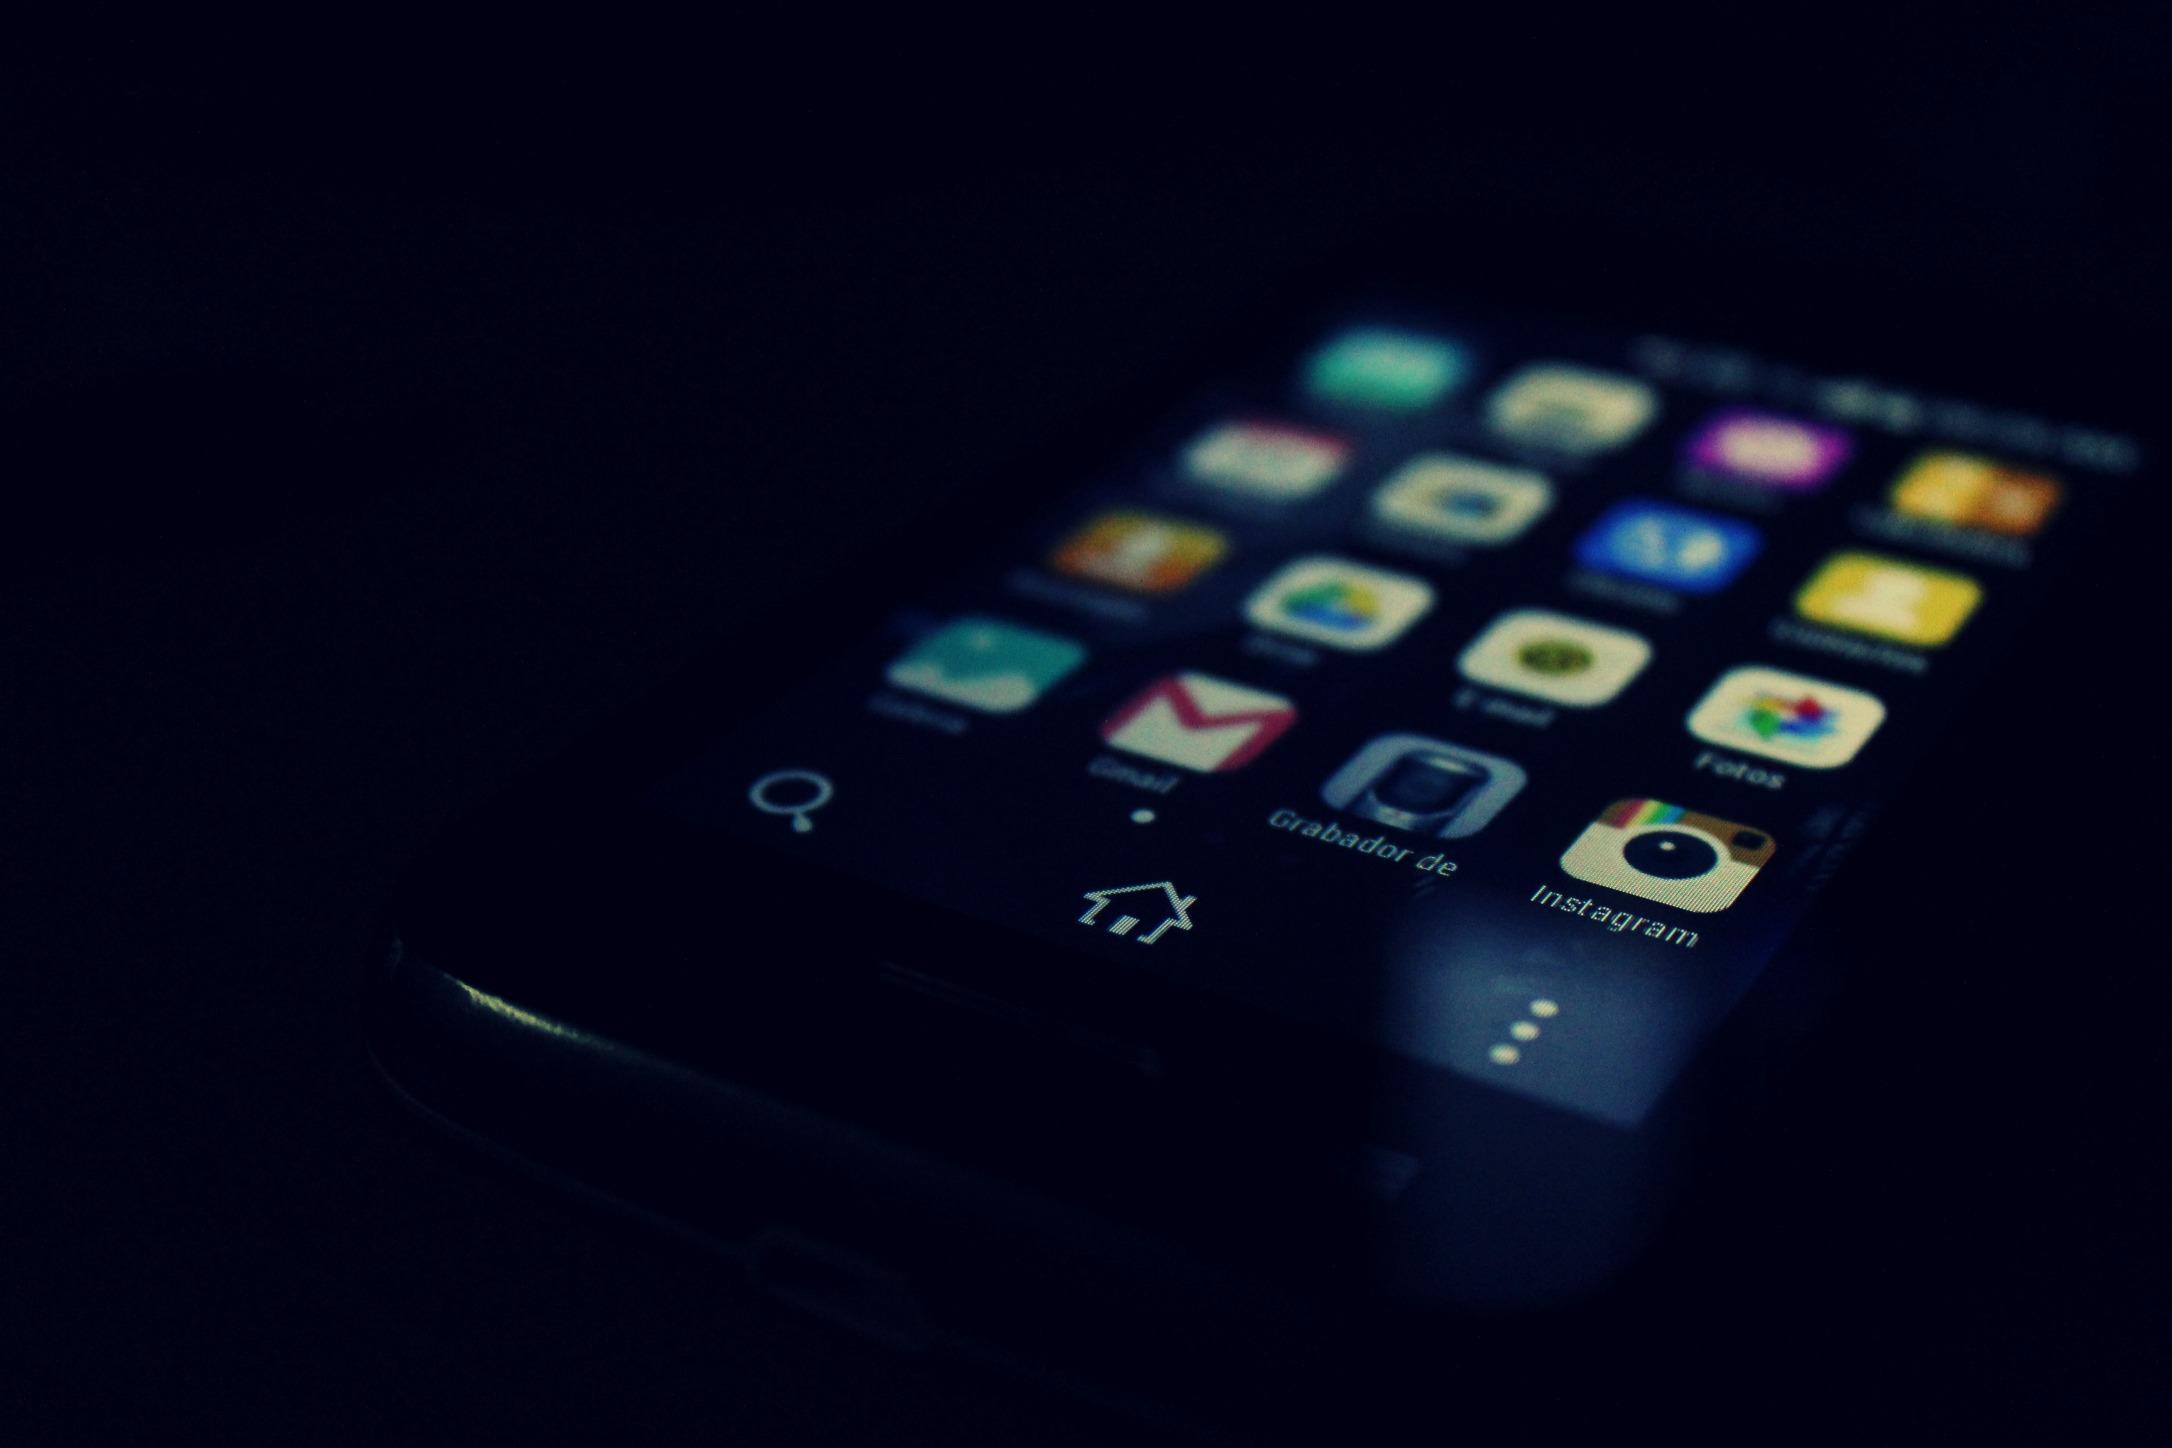 Nový materiál pre dotykové obrazovky zmení mobilné telefóny